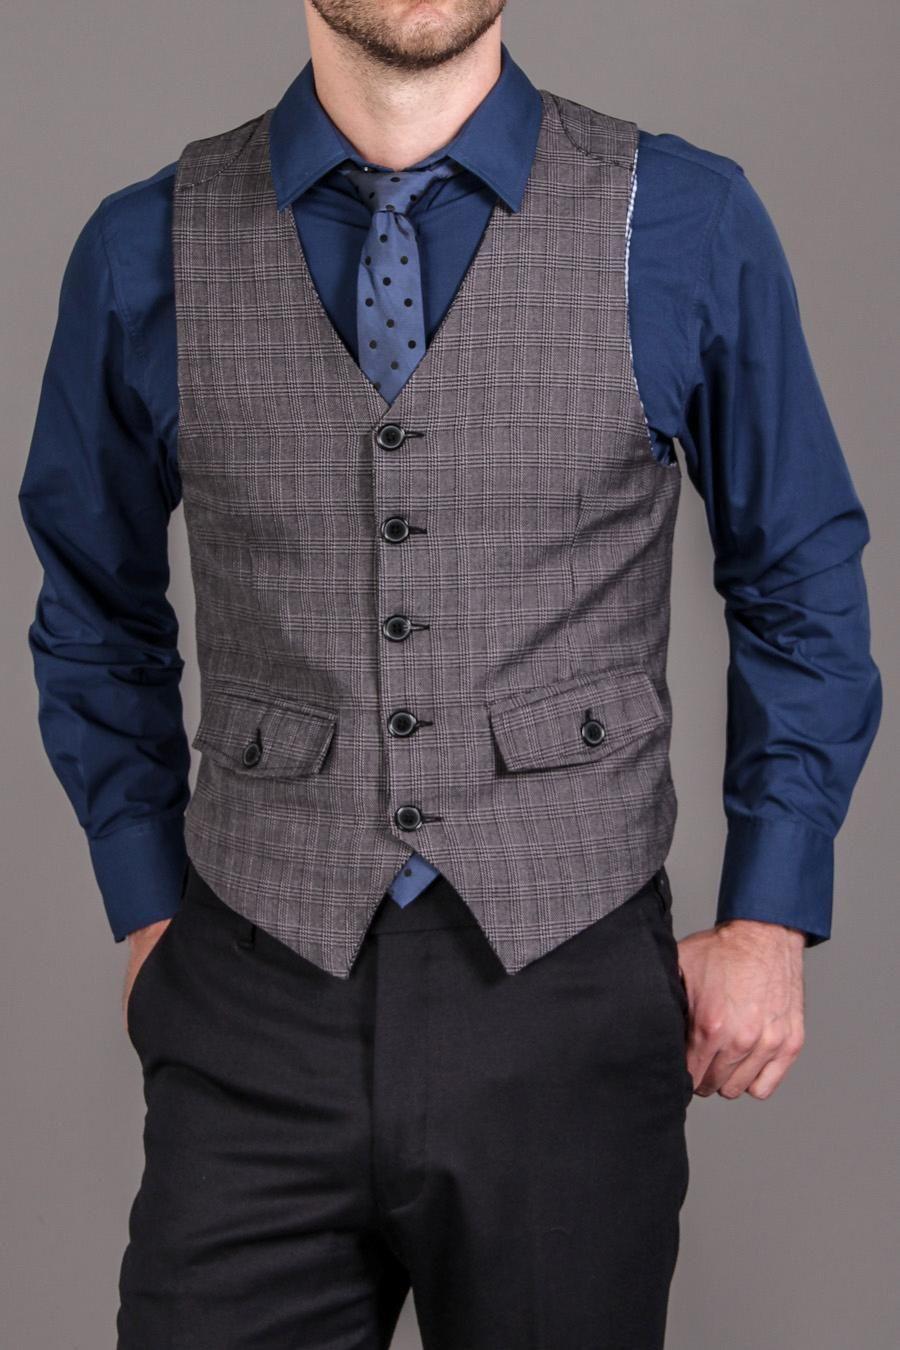 306888d70 Sovereign Code Shirt, Tie, Vest 3 Piece Set Grey Plaid/Navy | Manly ...